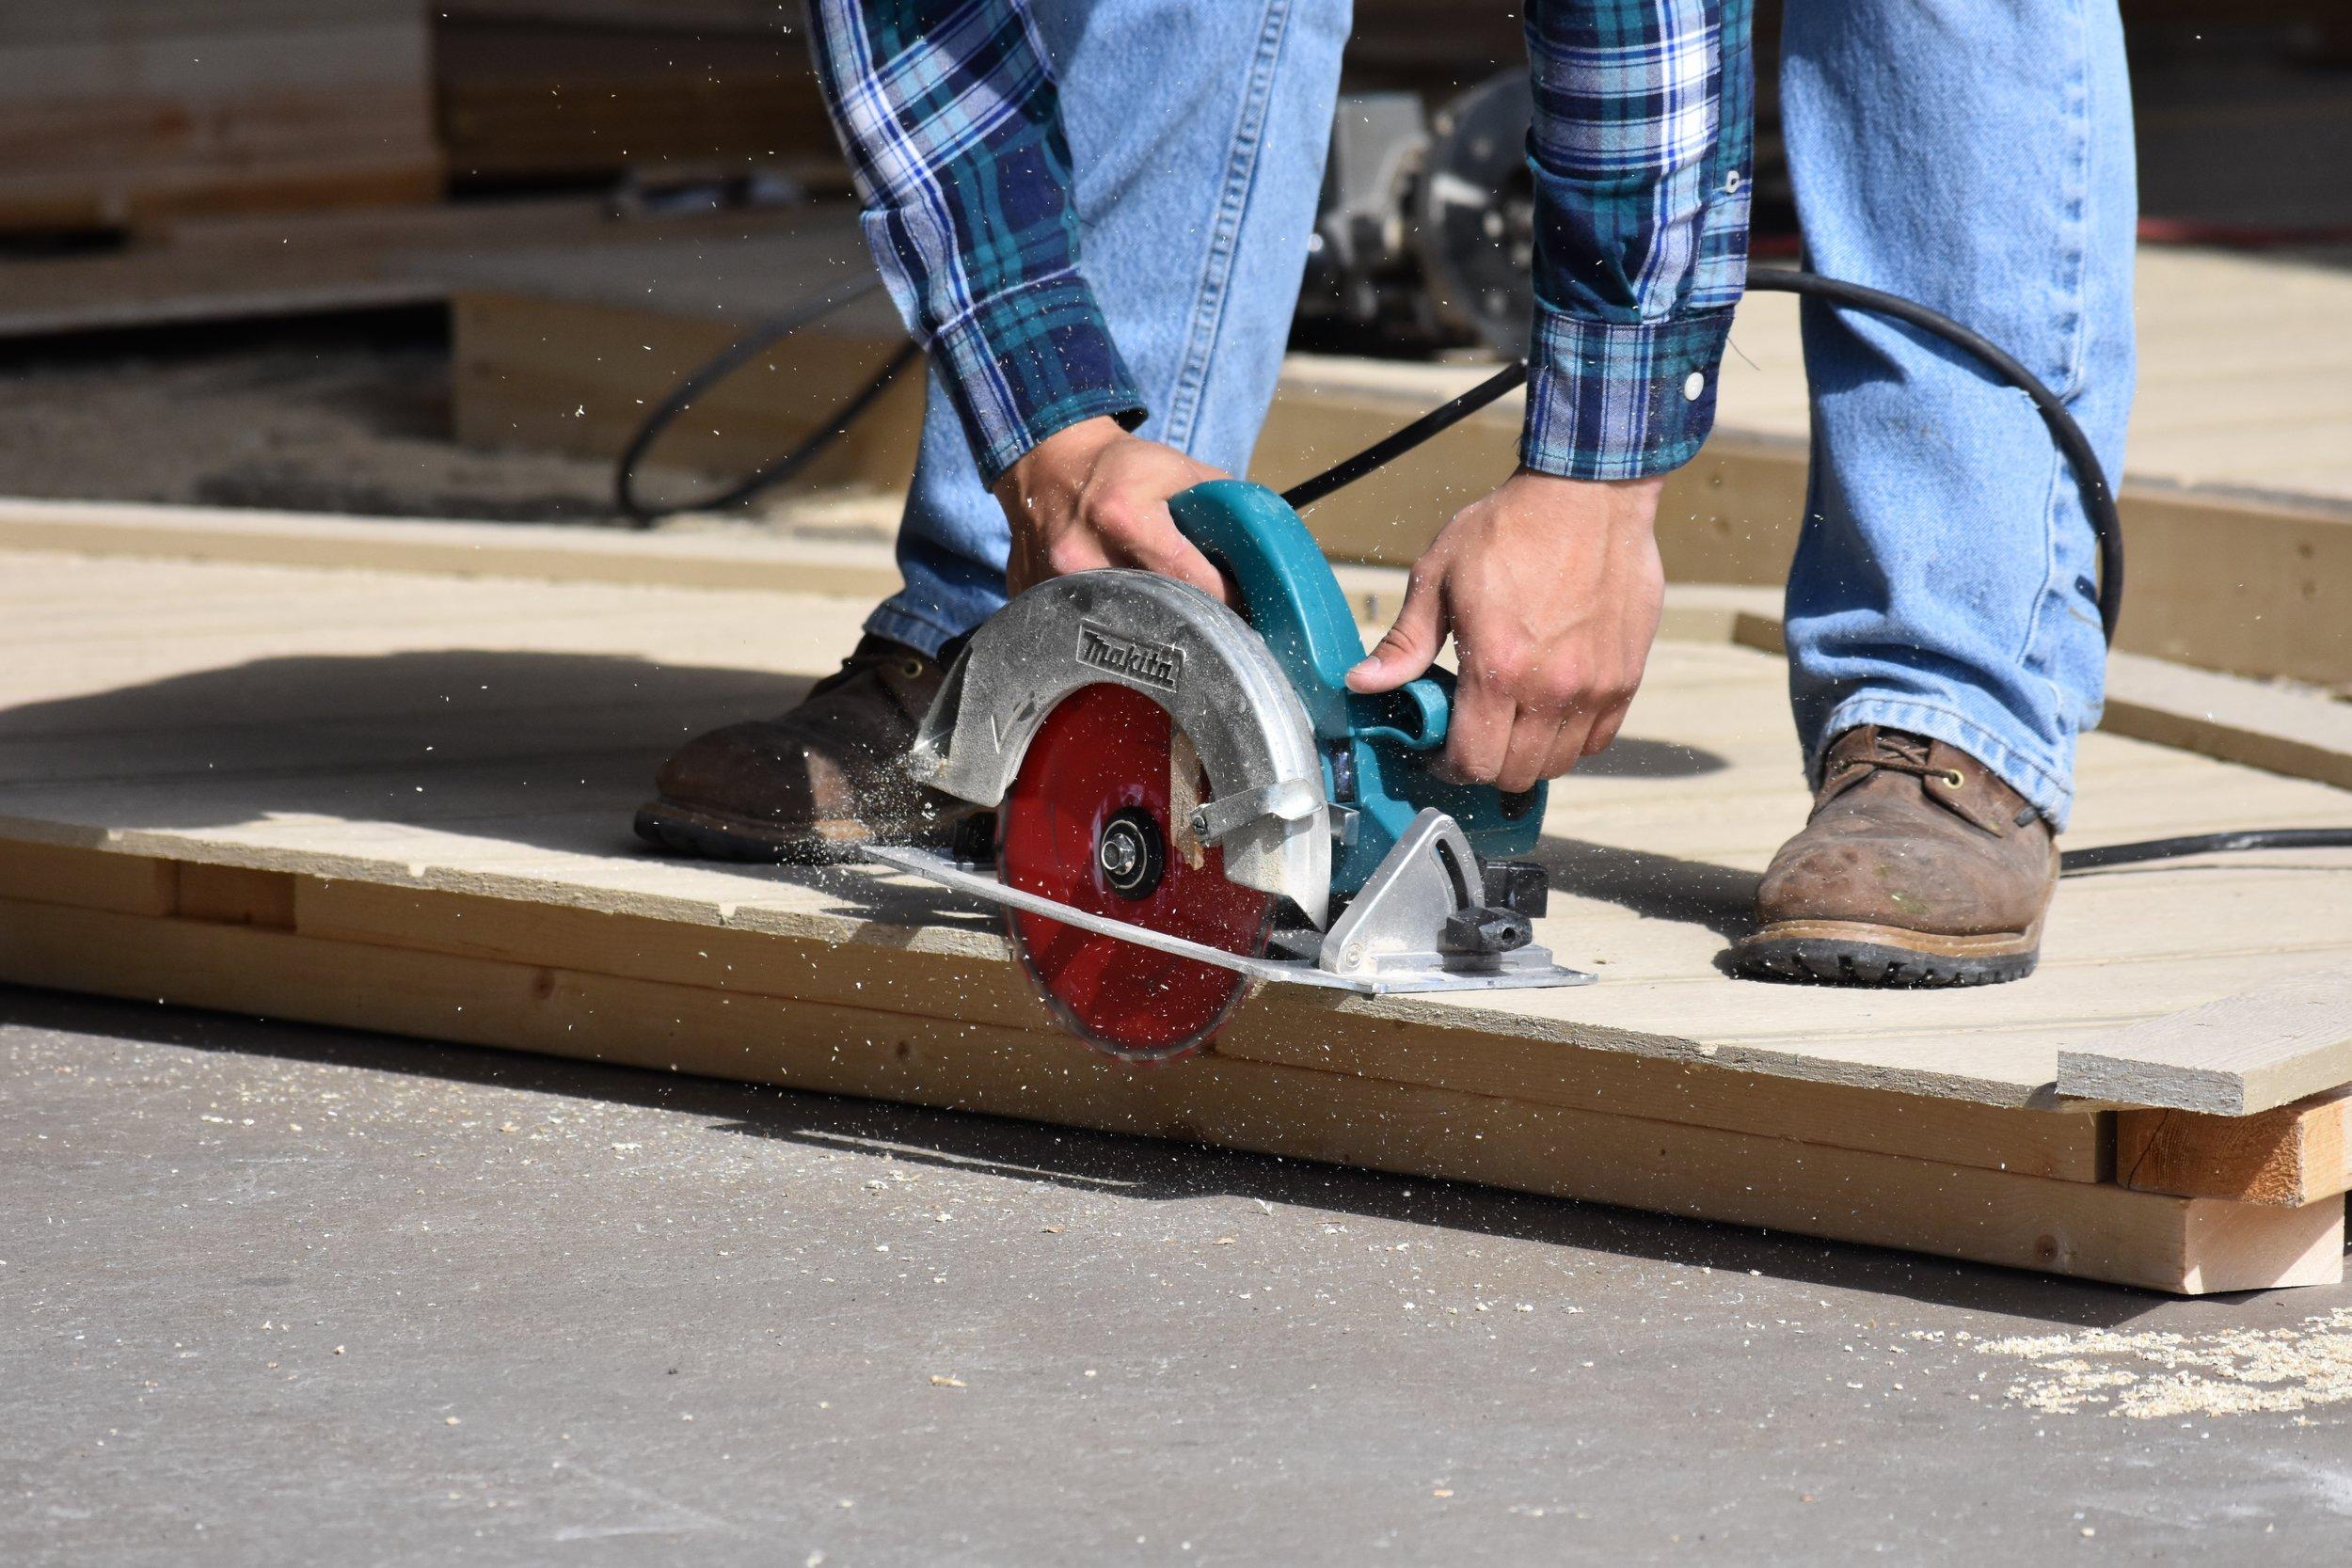 Vegas Sheds - Craftsman building walls